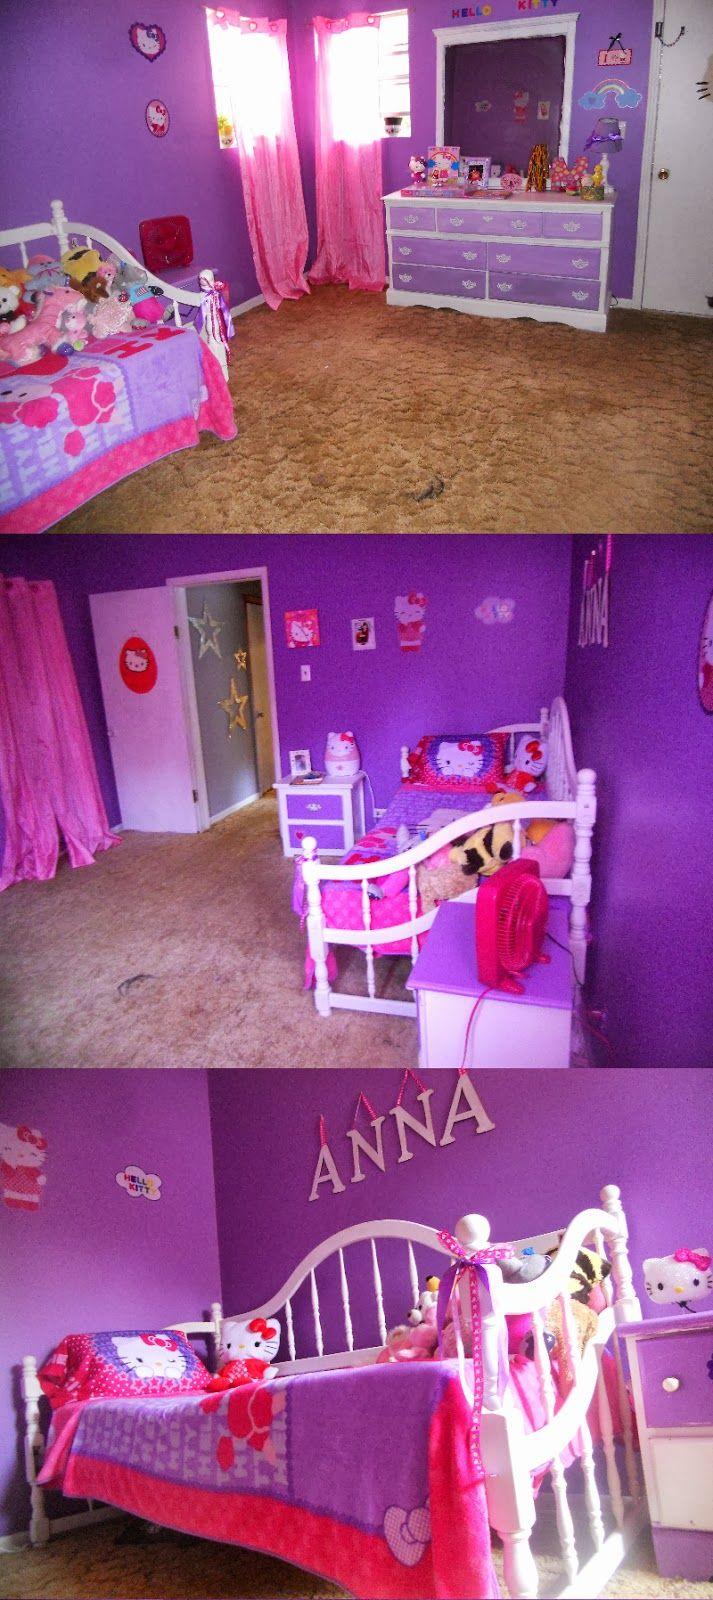 Hello kitty bedroom for baby - Anna S Hello Kitty Bedroom Diy Hello Kitty Bedroom